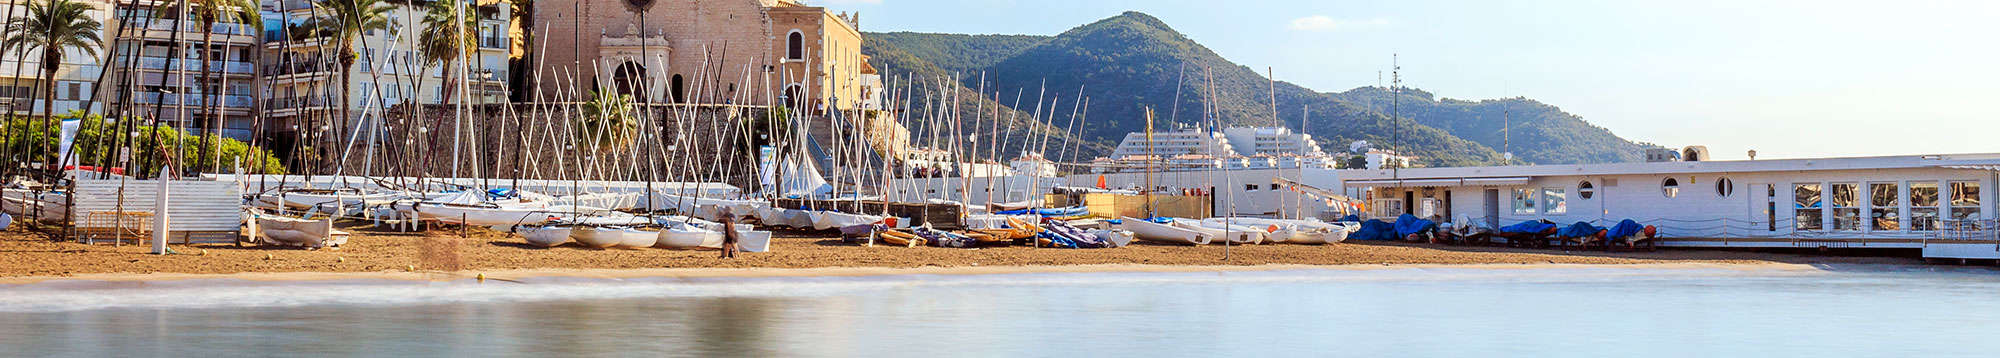 Escapadas fin de semana en Sitges